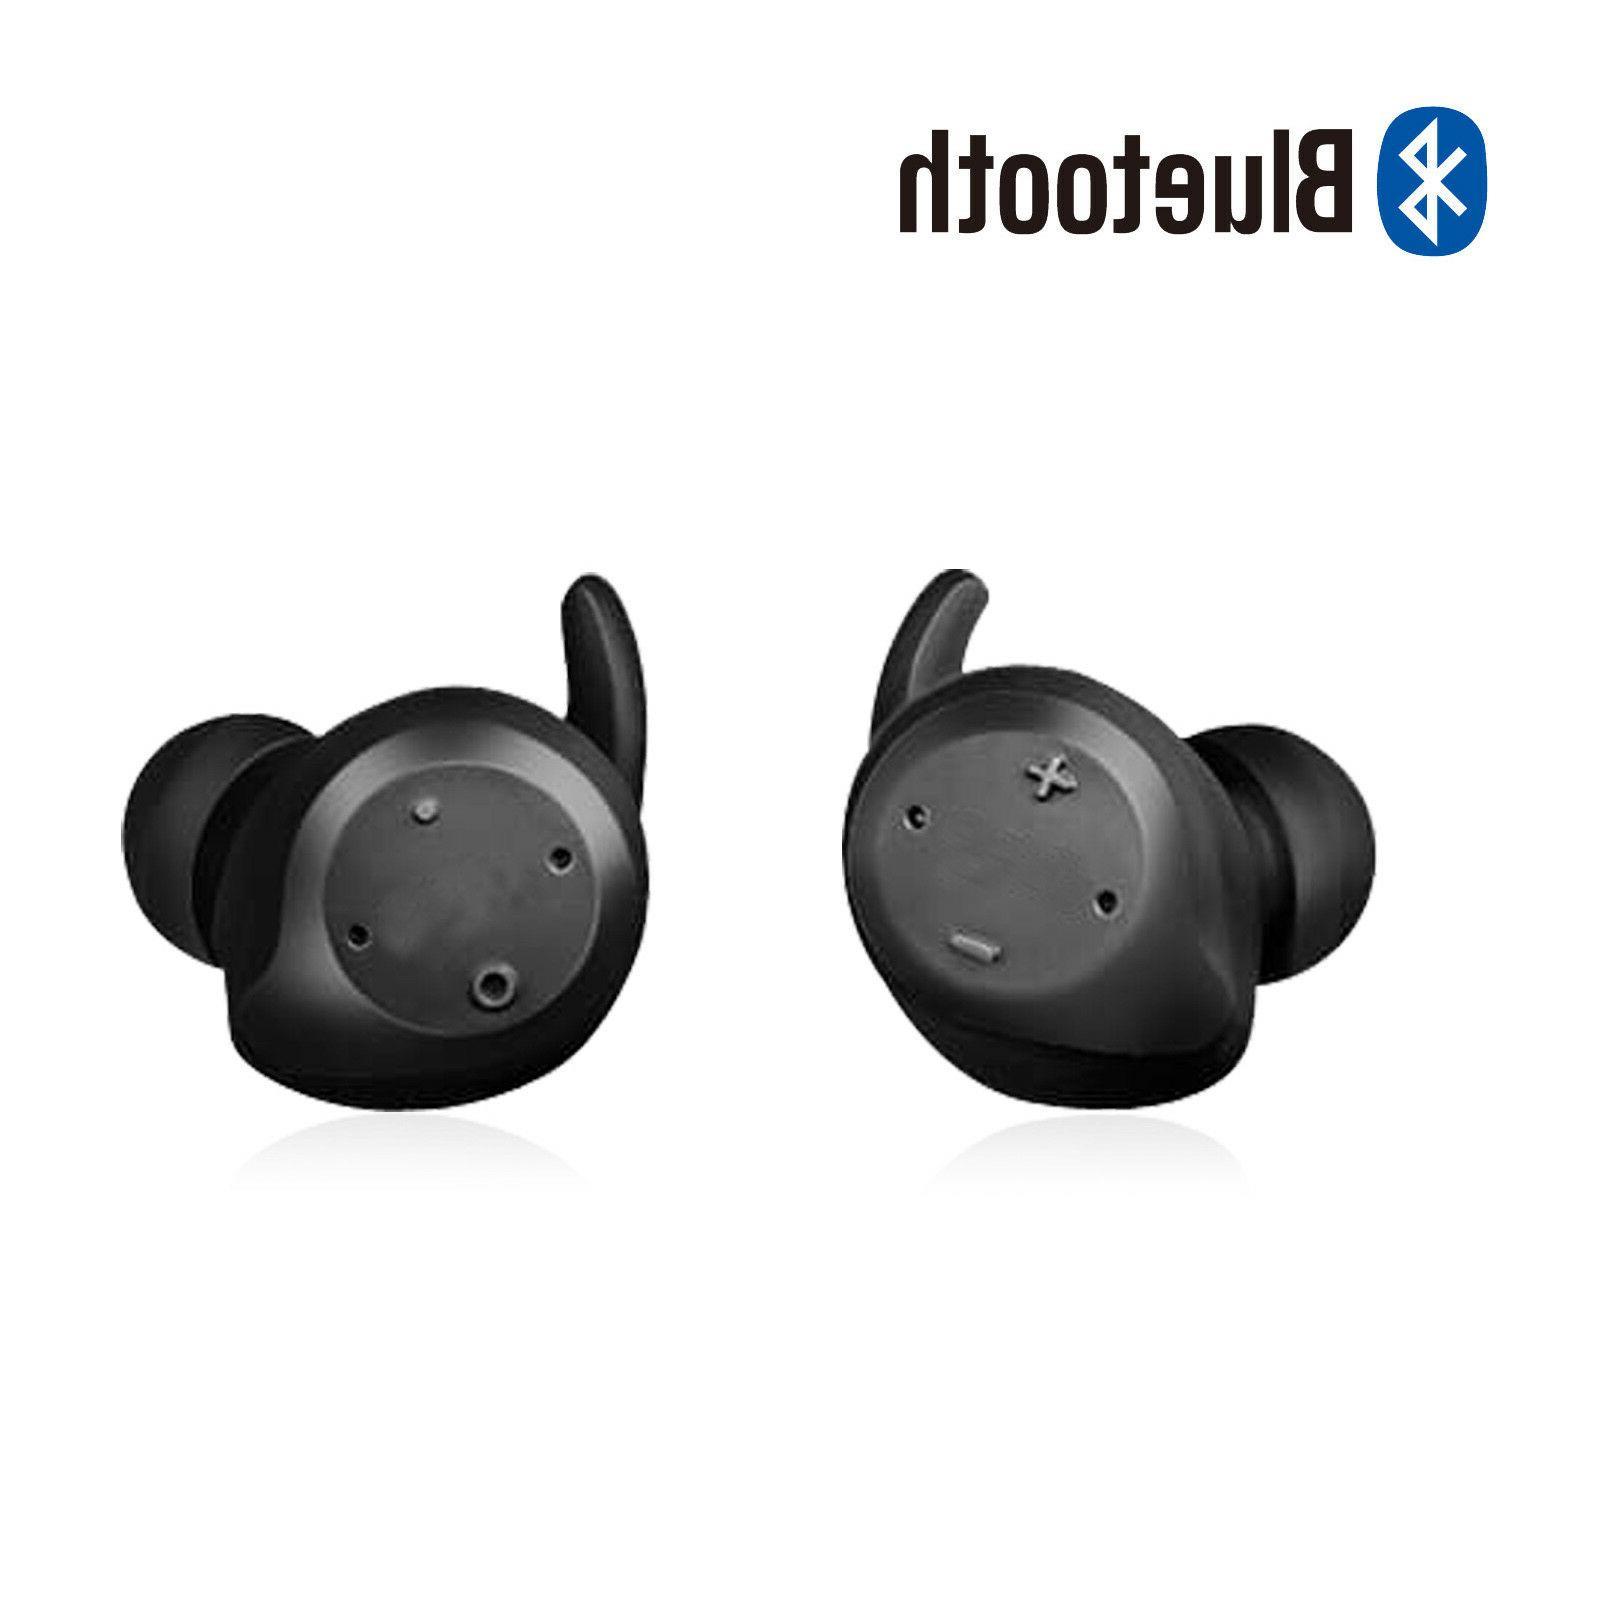 Dual Earphones for X 8 Plus LG